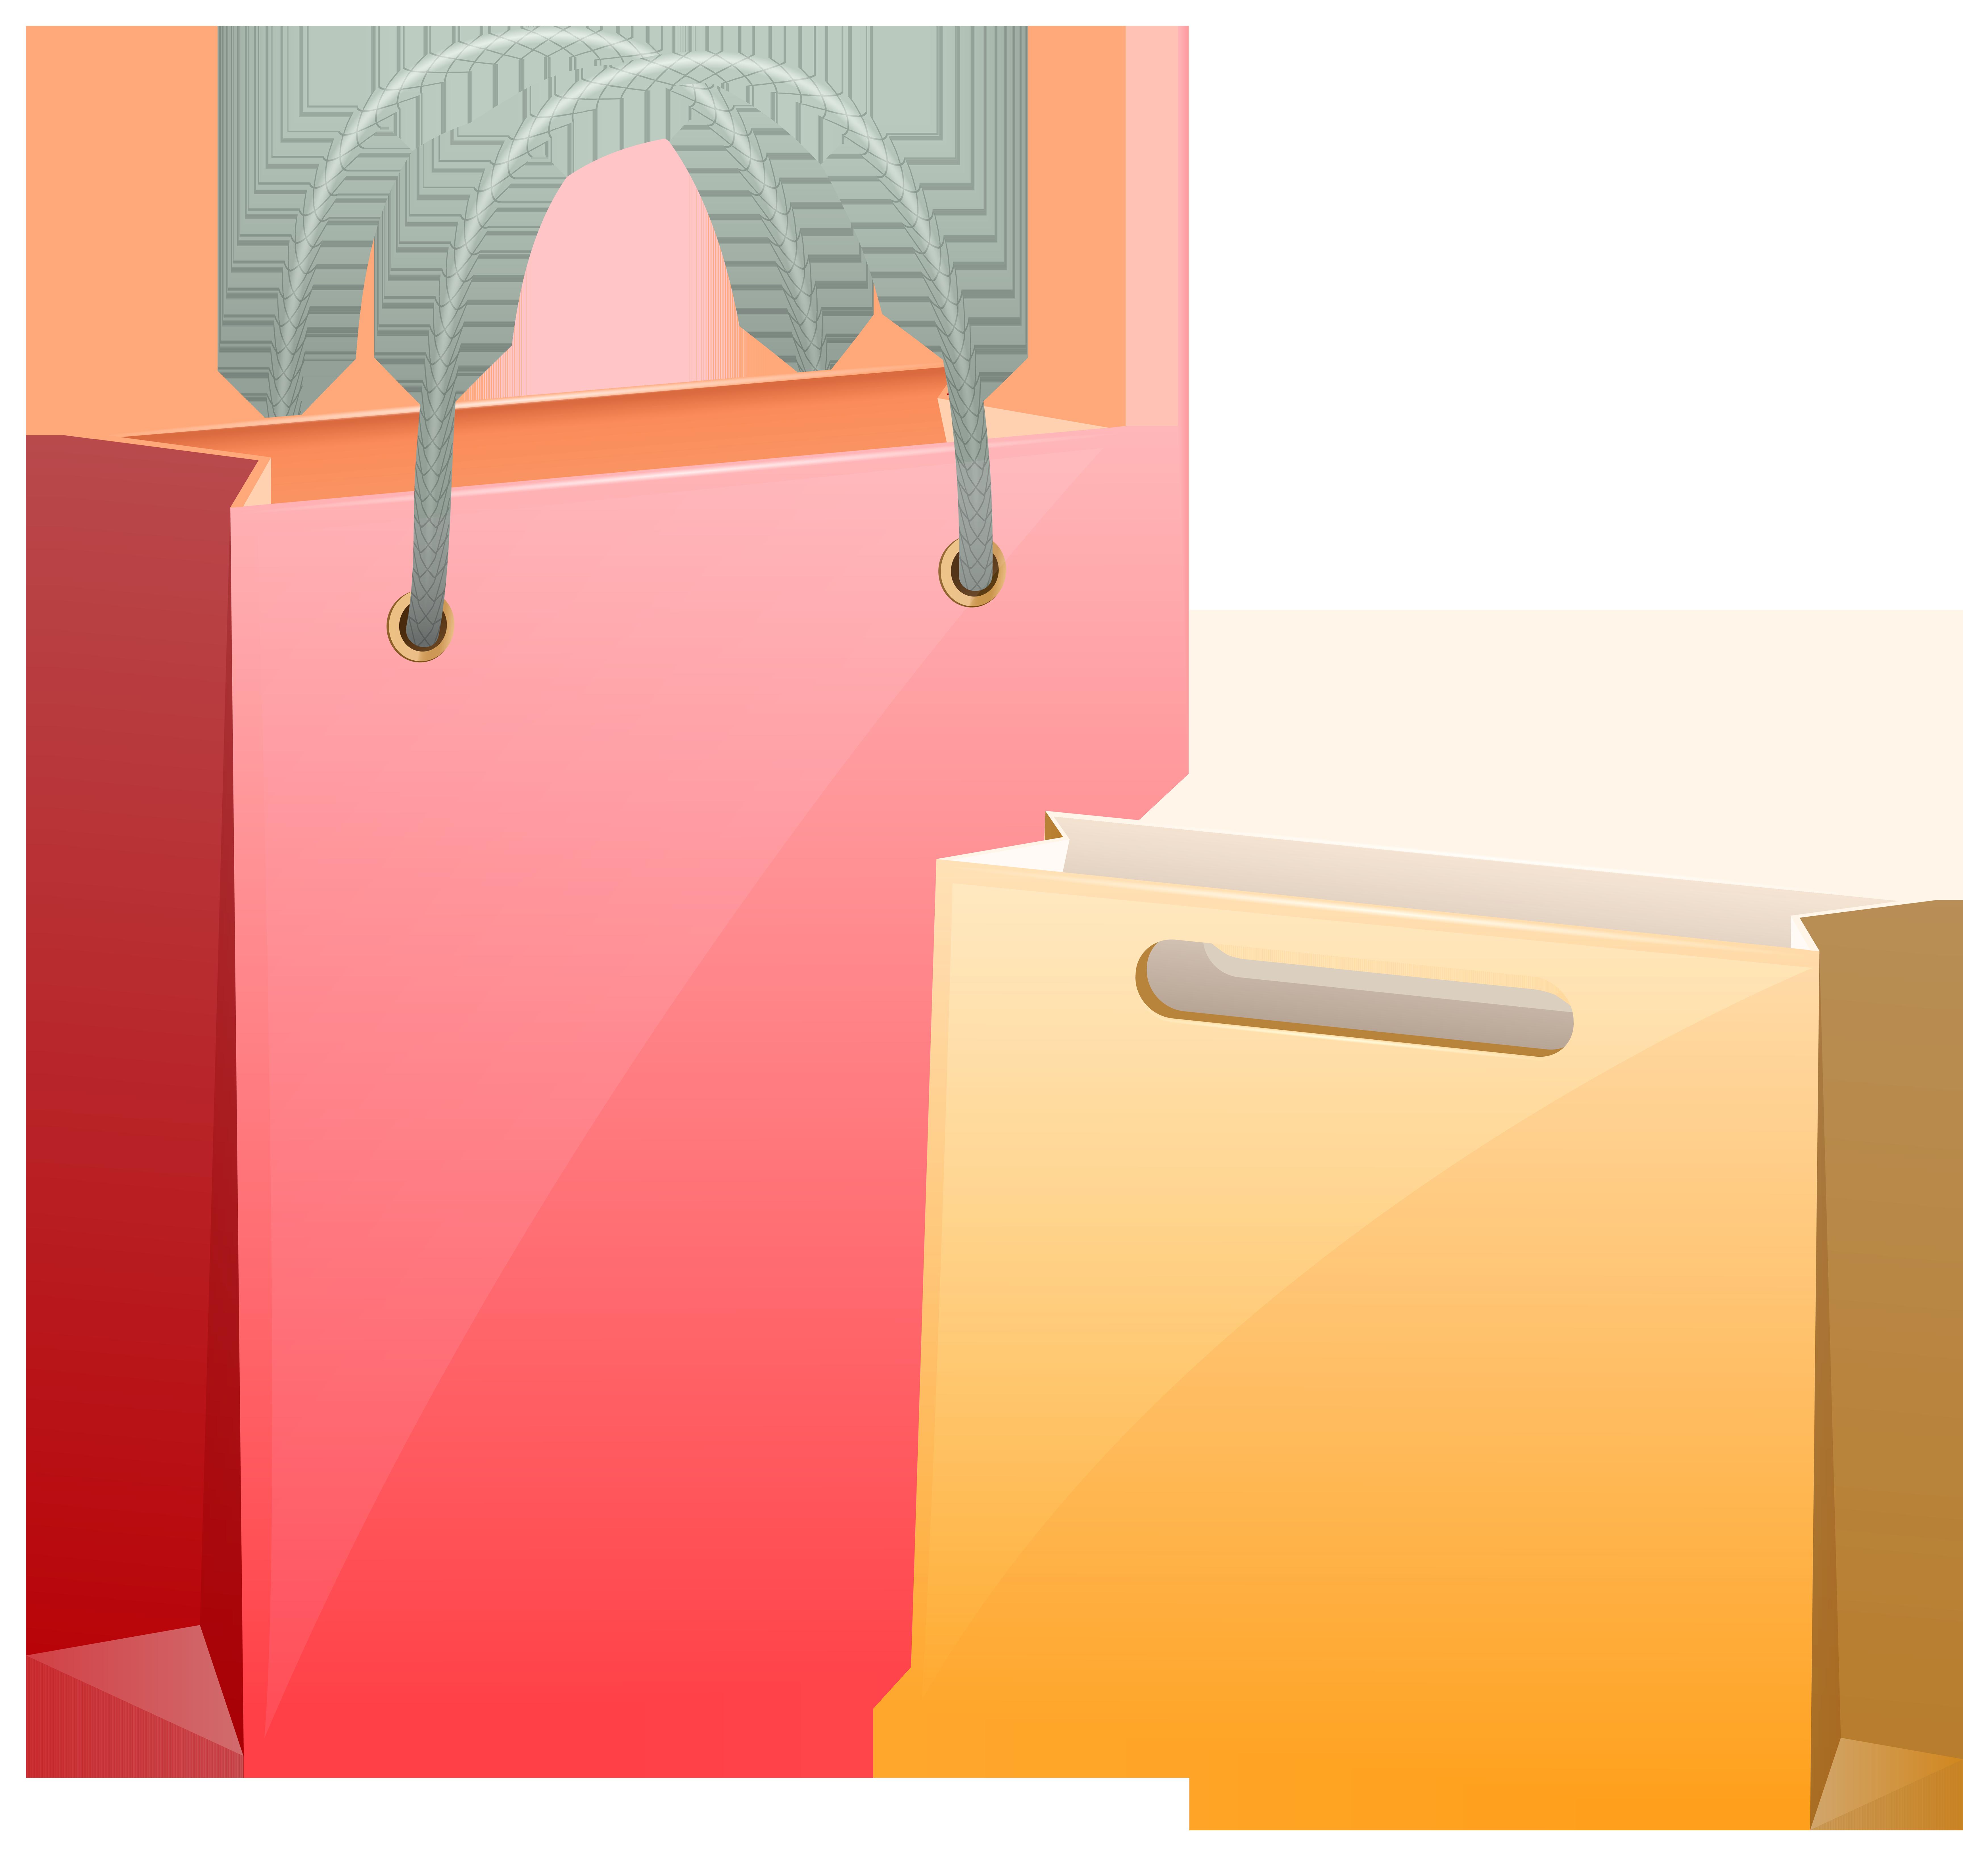 Bag clipart gift. Bags png clip art